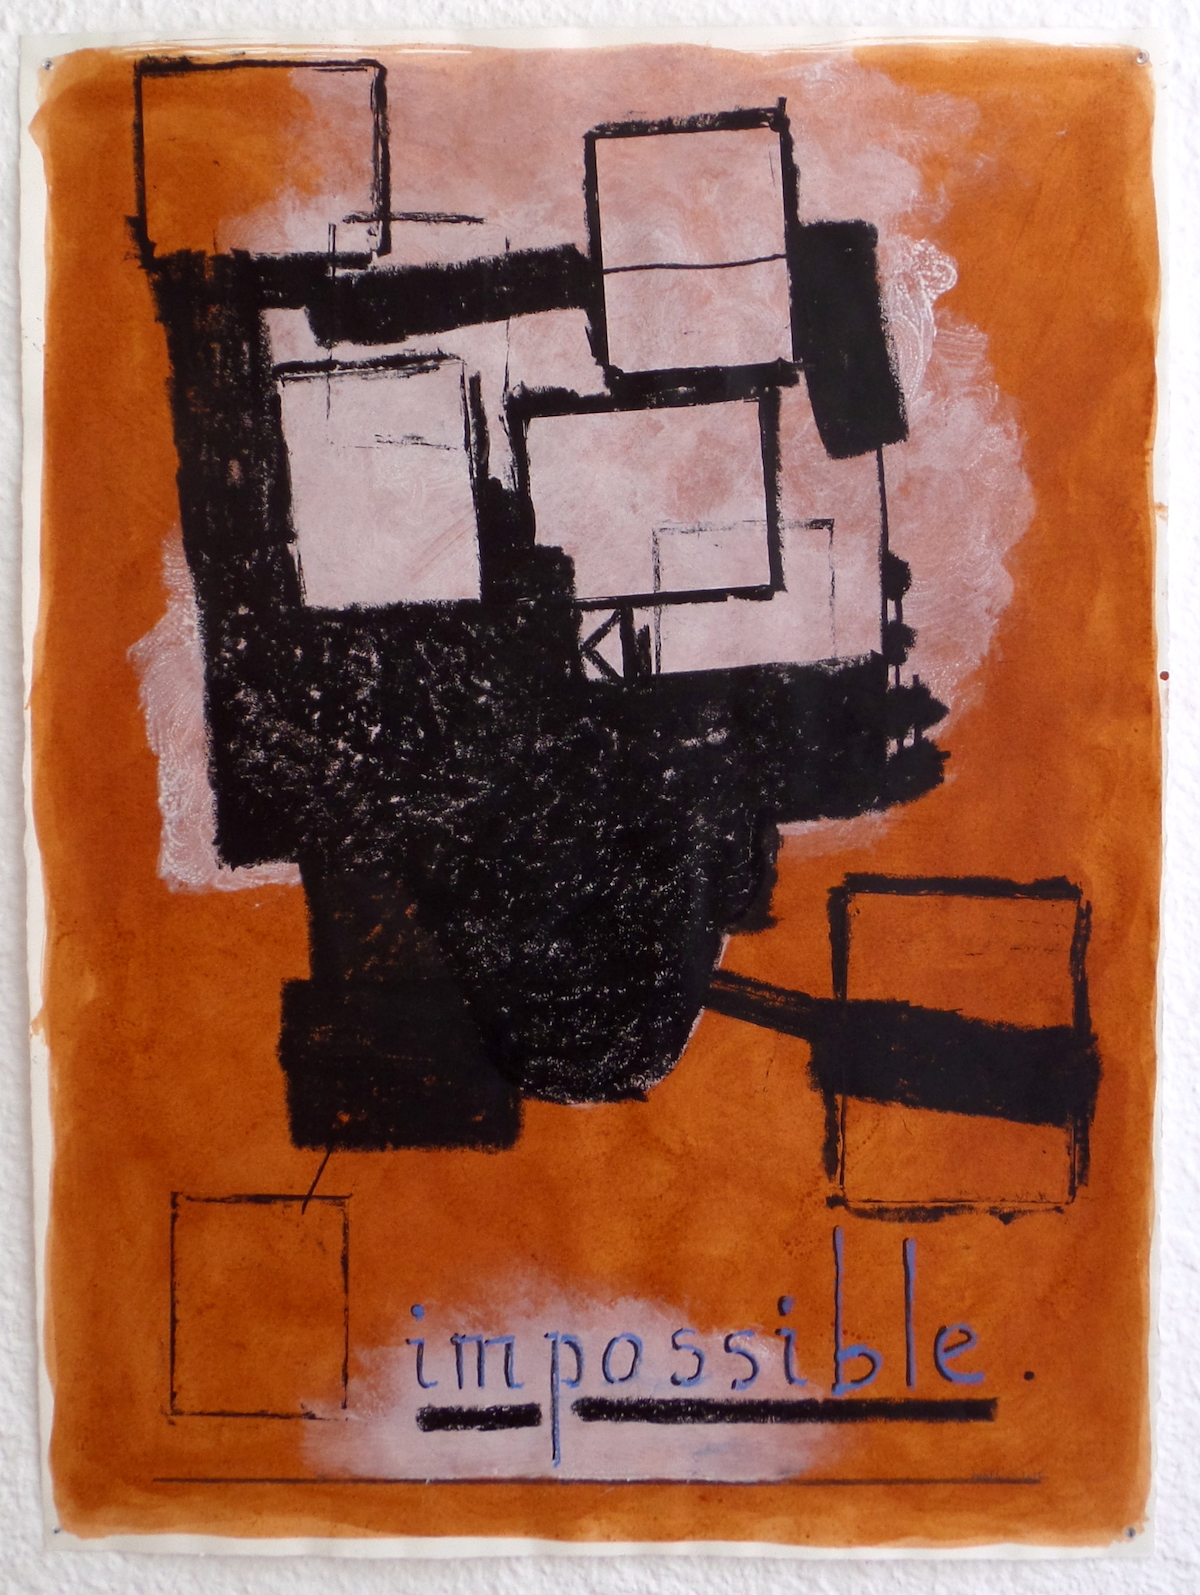 Galerie oniris rennes jean michel alberola impossible ii 2016 original